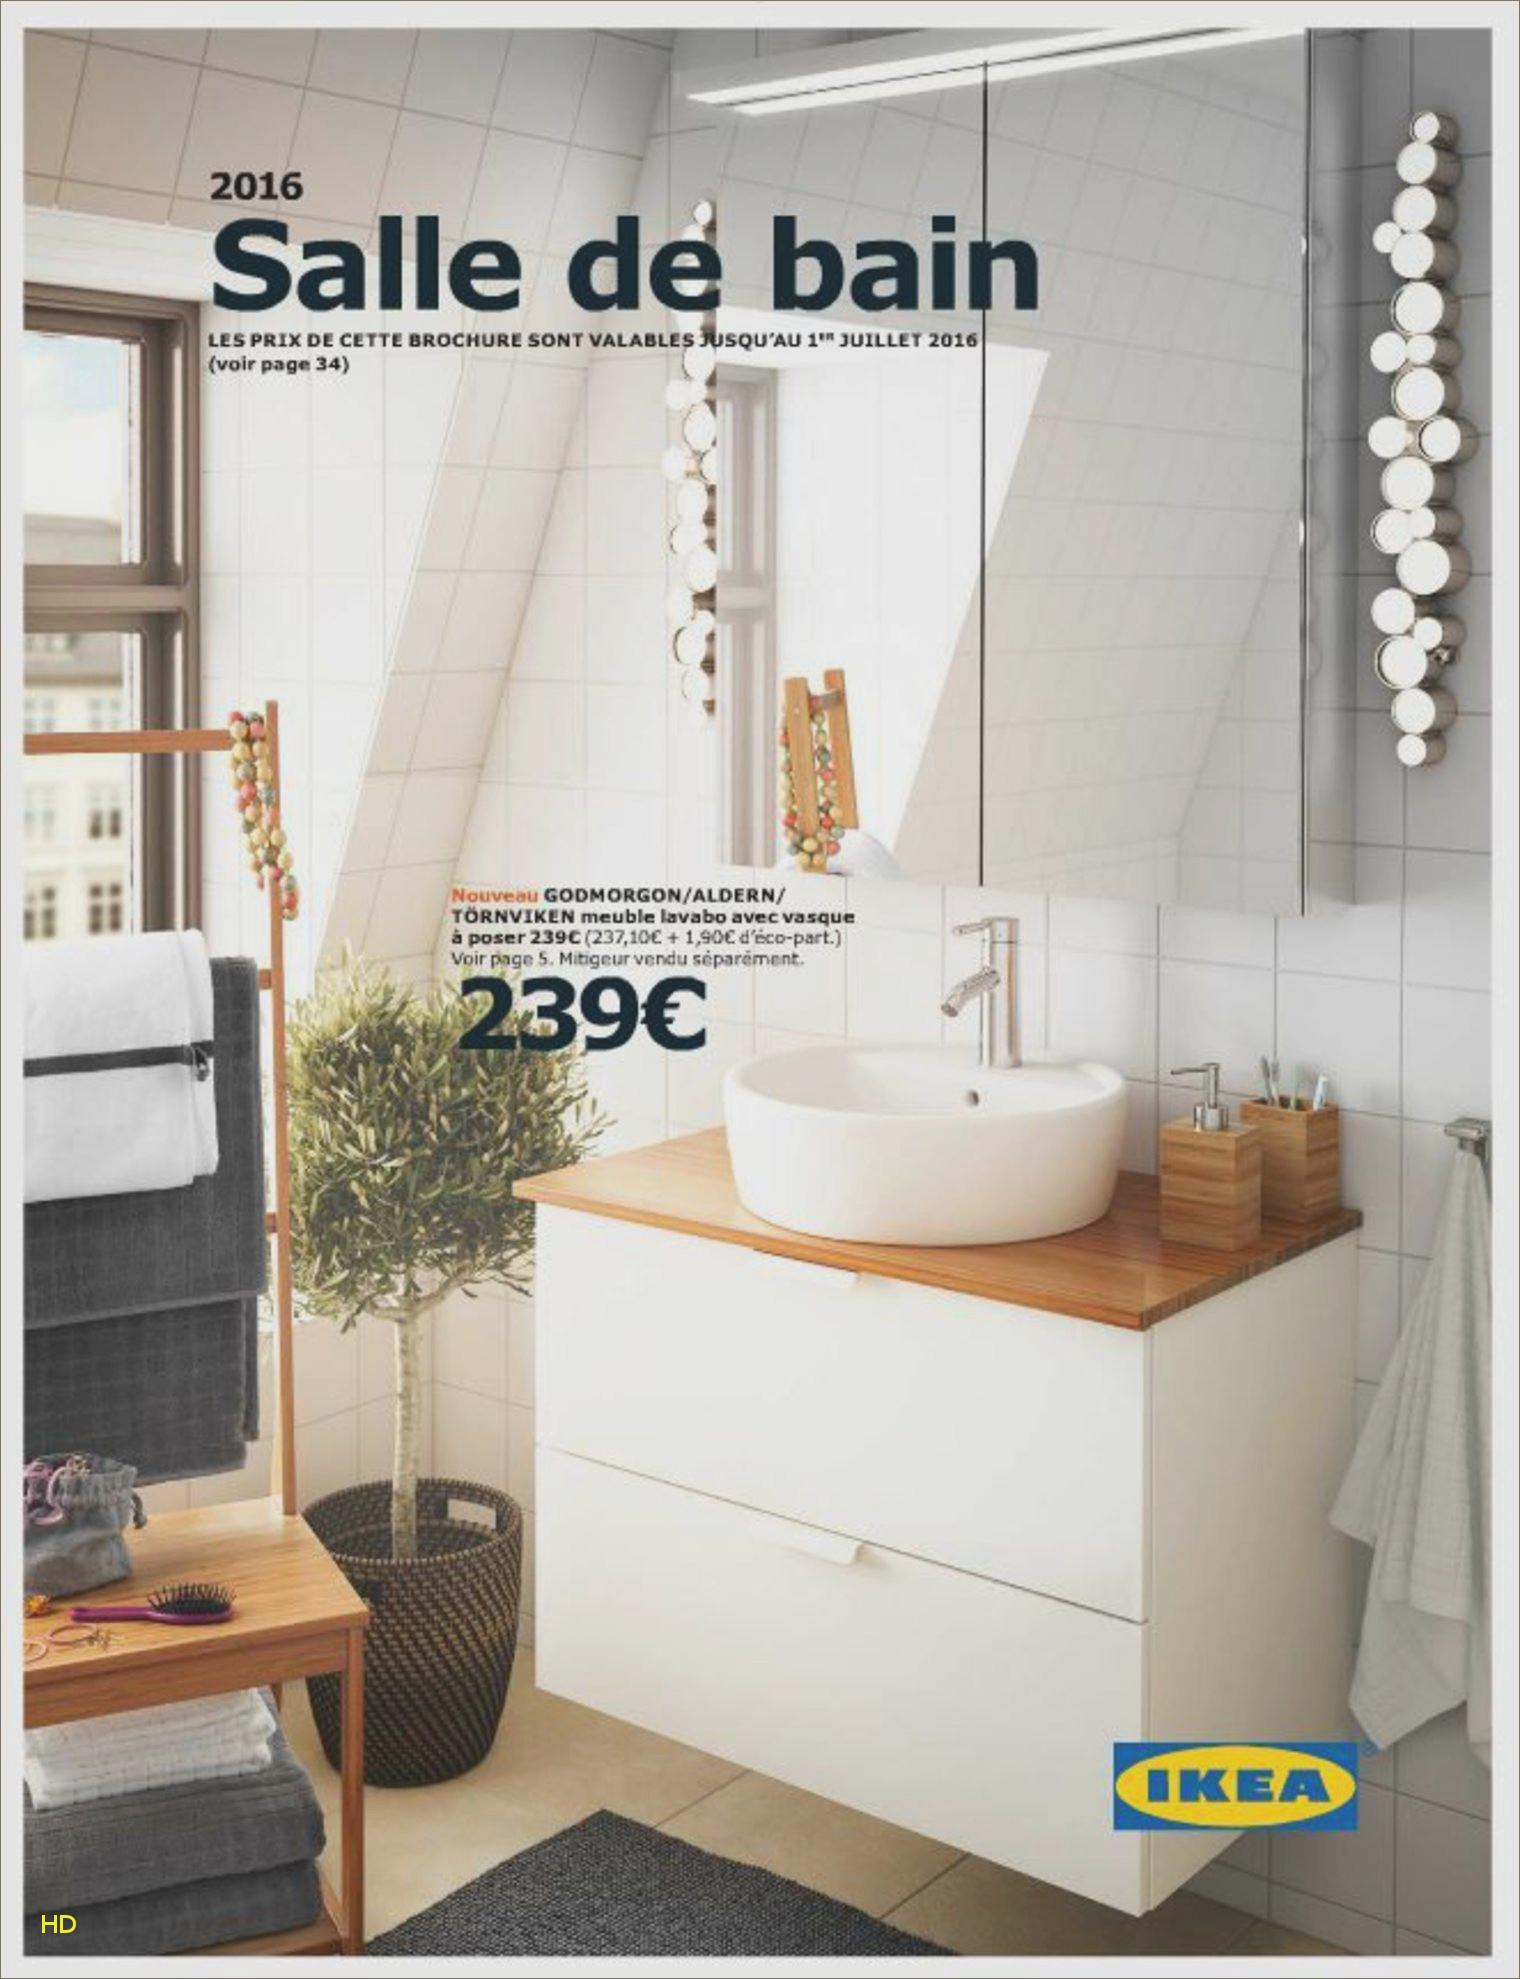 Eclairage Salle De Bain Ikea Inspirant Photos Lampe Salle Archives Bain